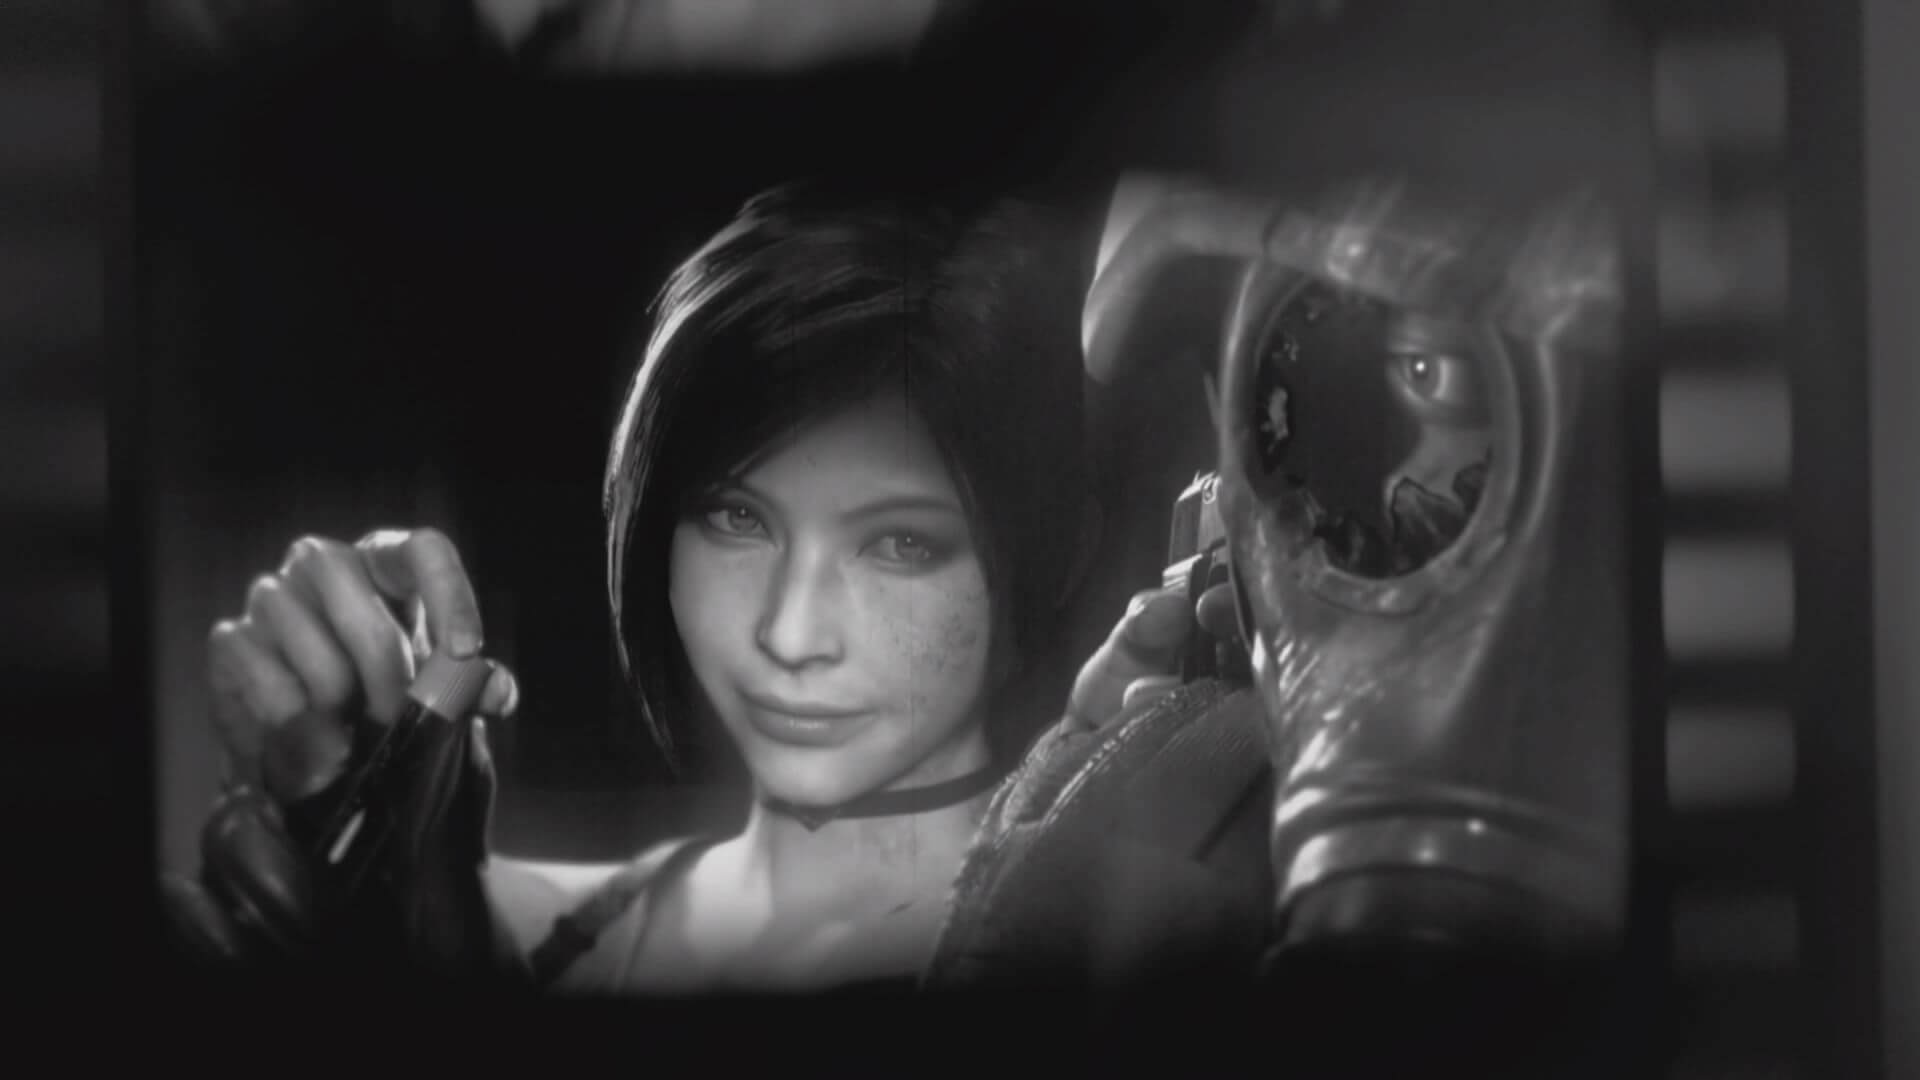 Resident Evil 2 Remake - The Ghost Survivors